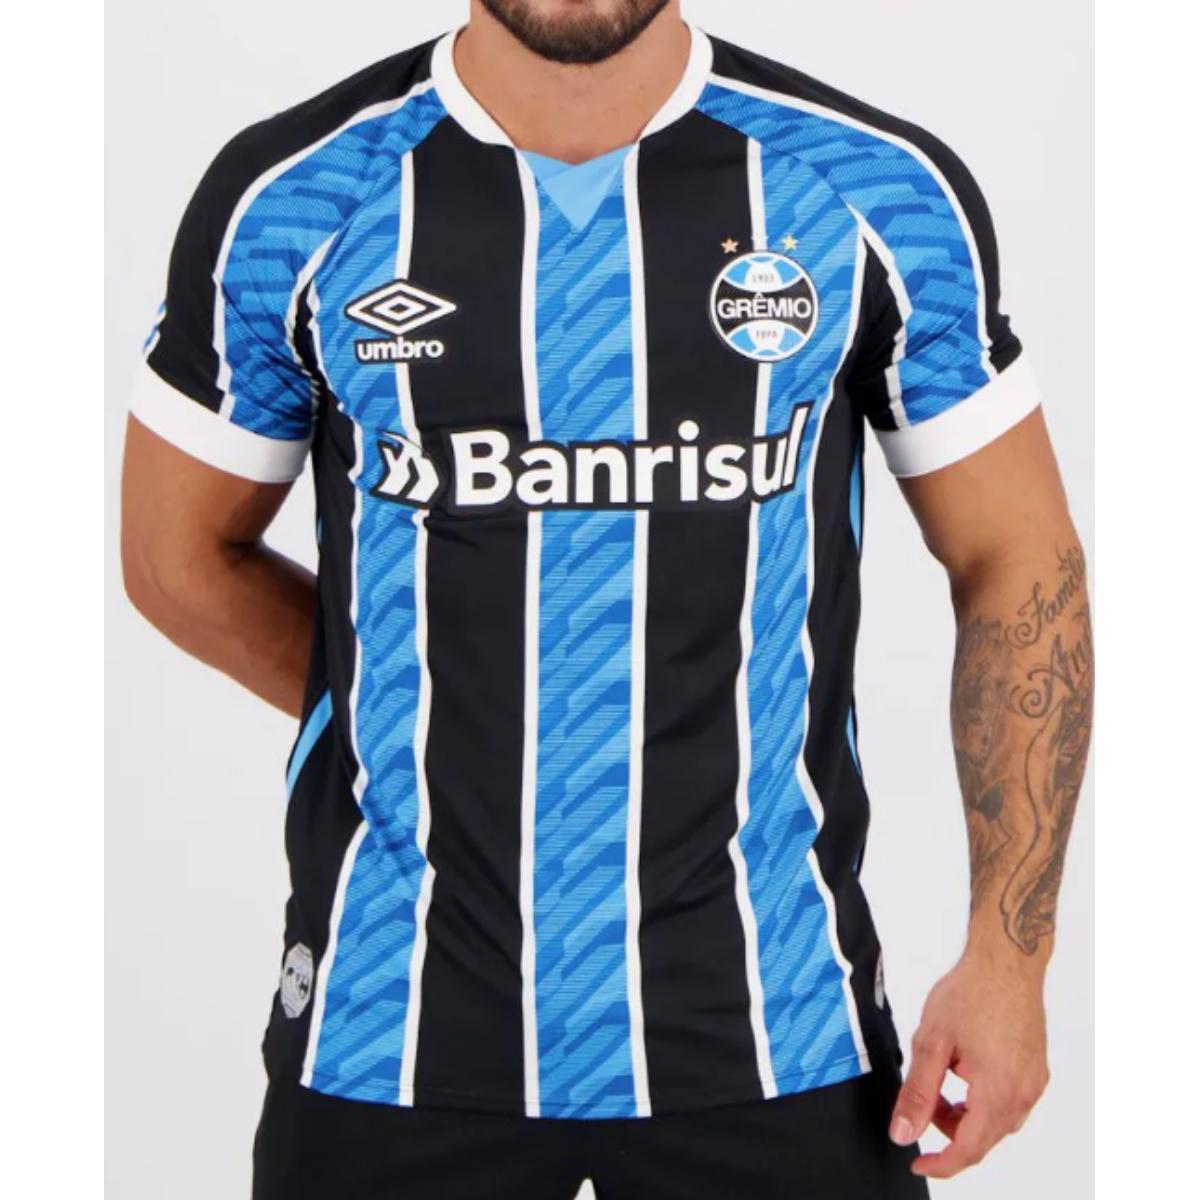 Camiseta Masculina Grêmio 3g161164 of i 2020 Classic S/n Tricolor